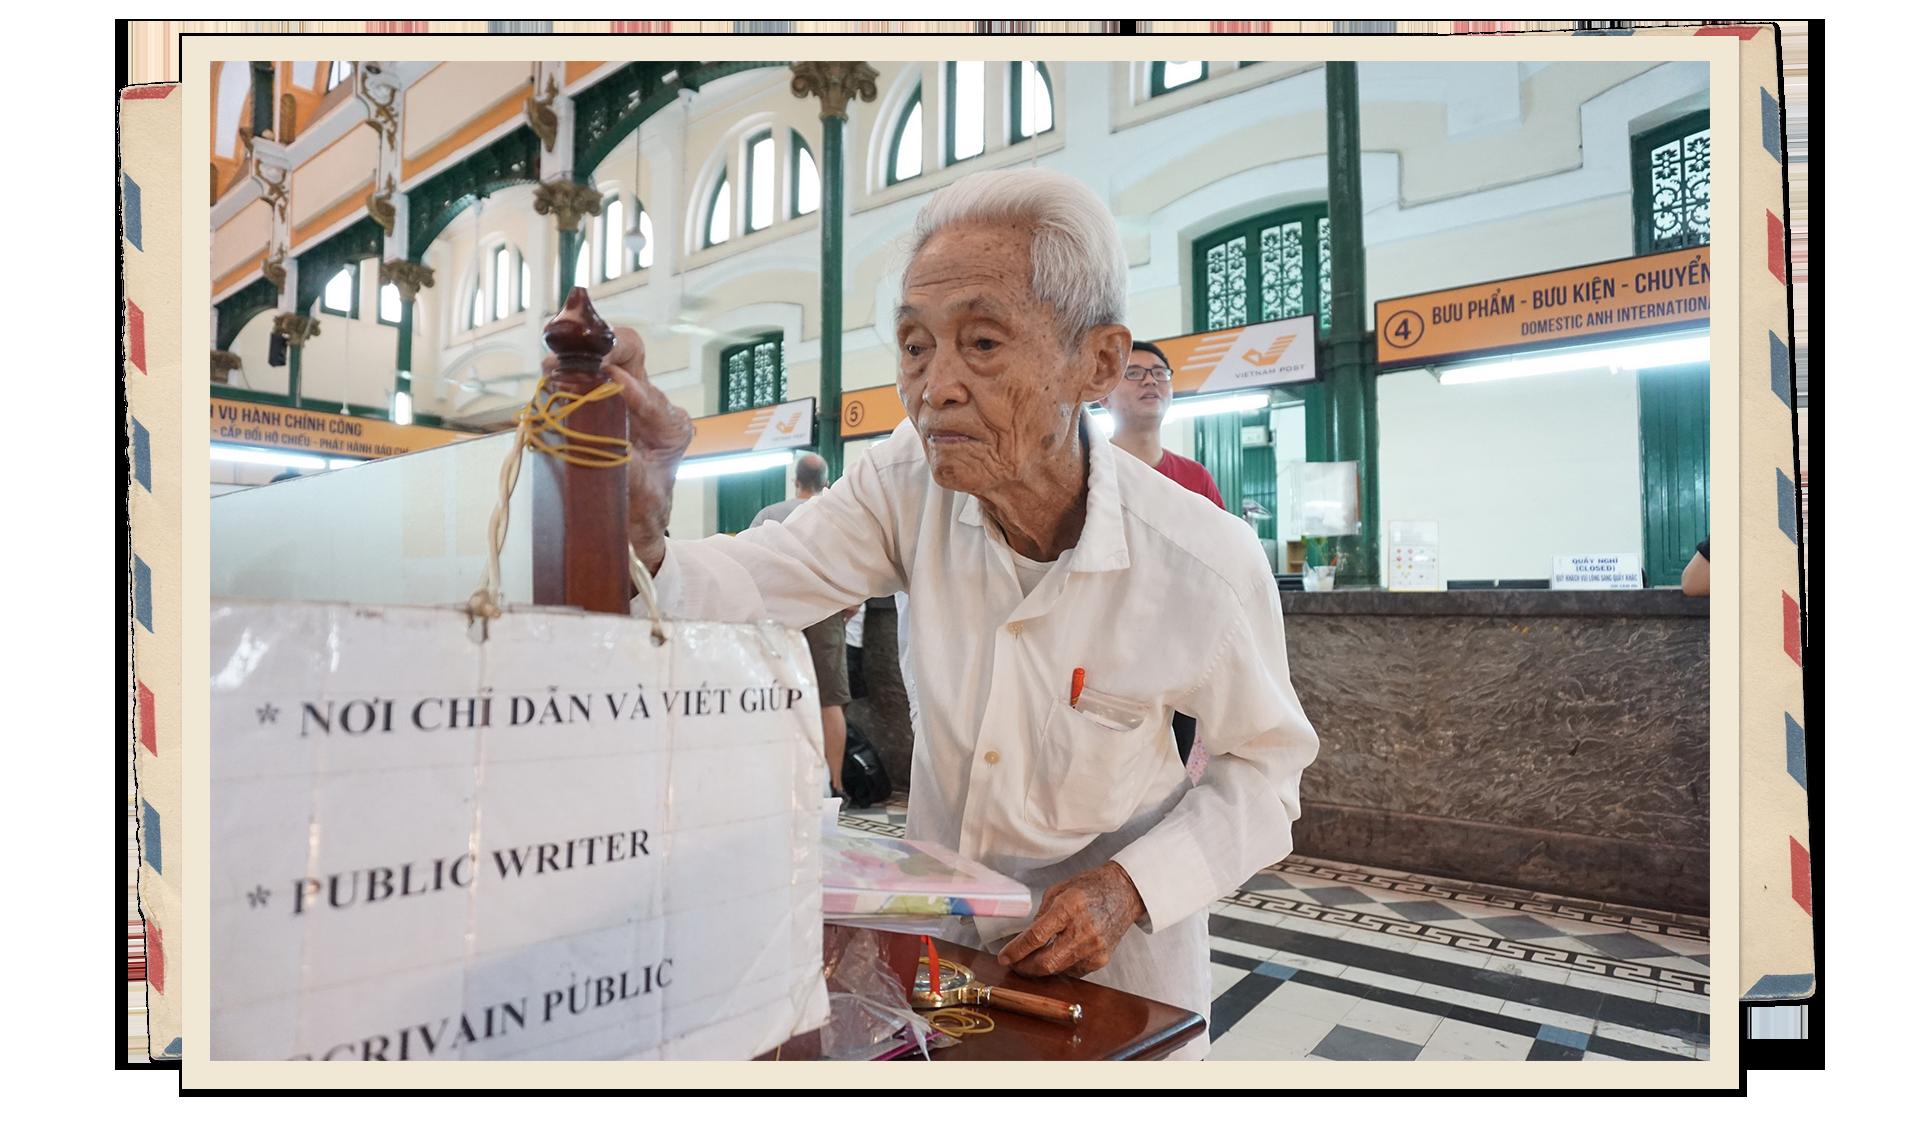 Saigon's last public writer still active at age 89